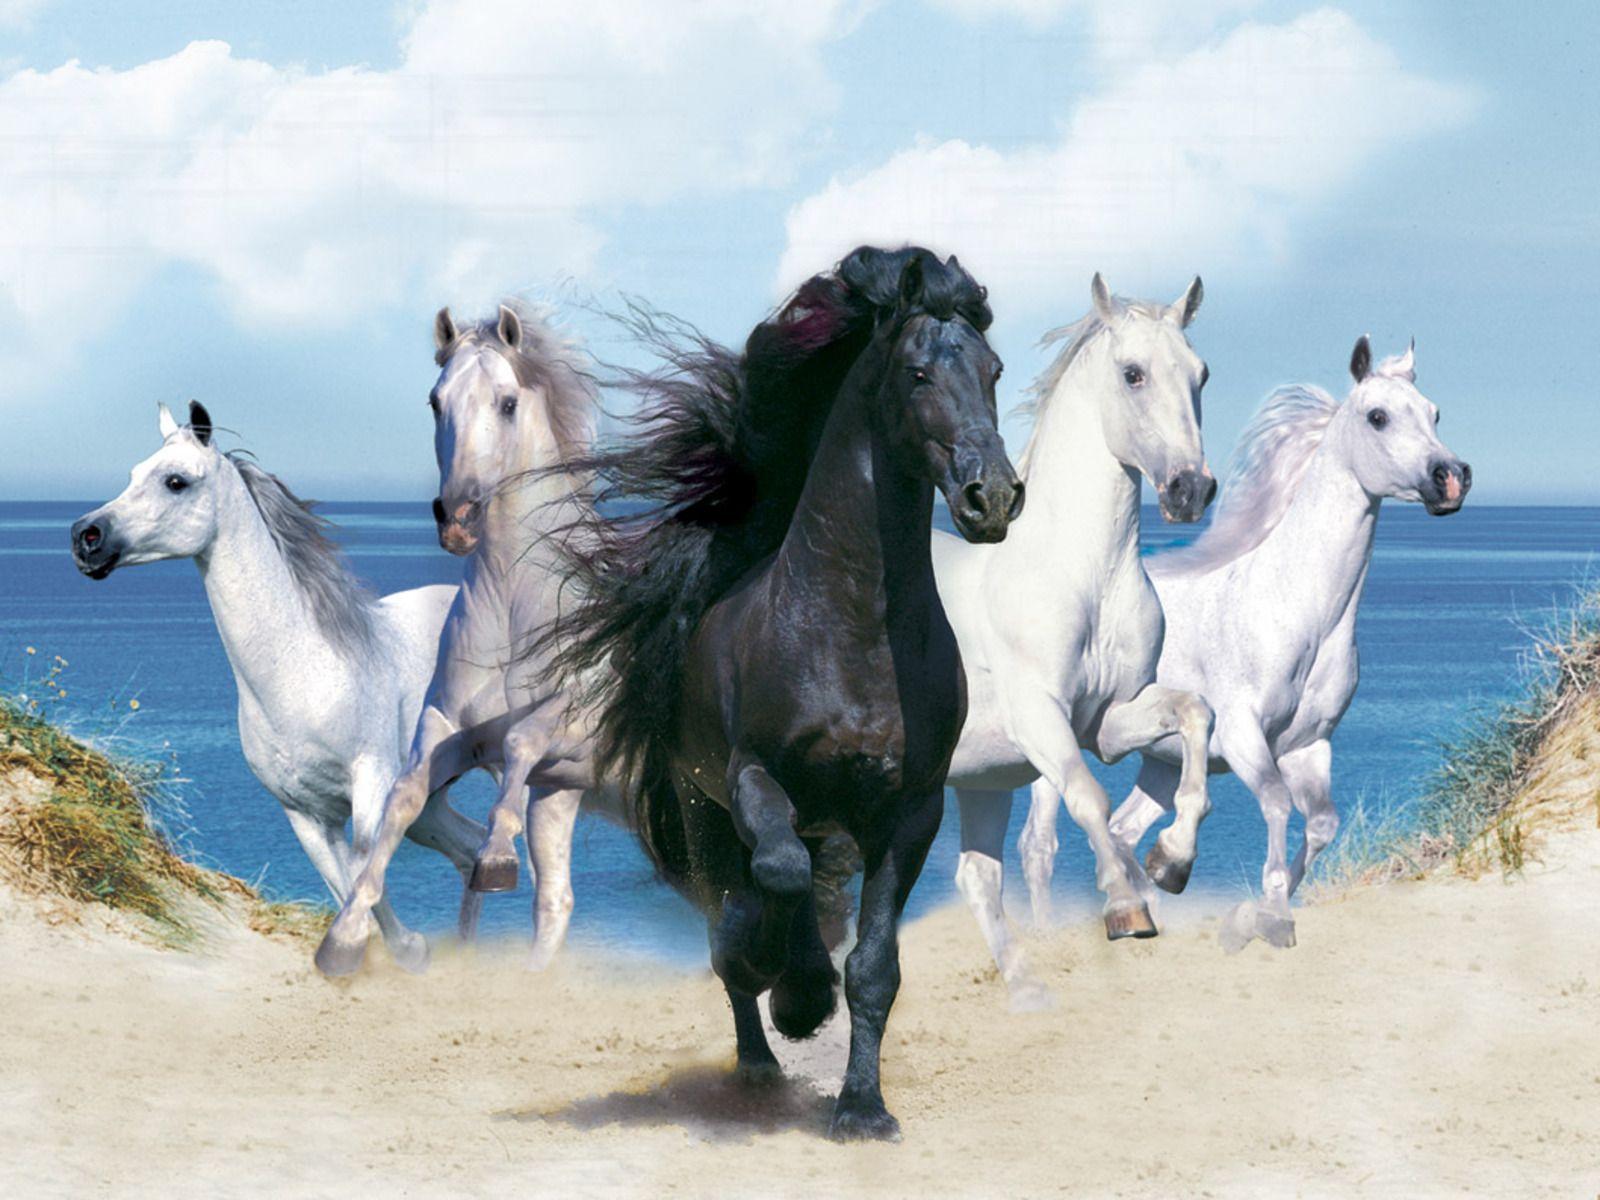 Beautiful Wallpaper Horse Desktop Background - ed59729ba4b554df14db6ad75b0d75bb  You Should Have_485685.jpg